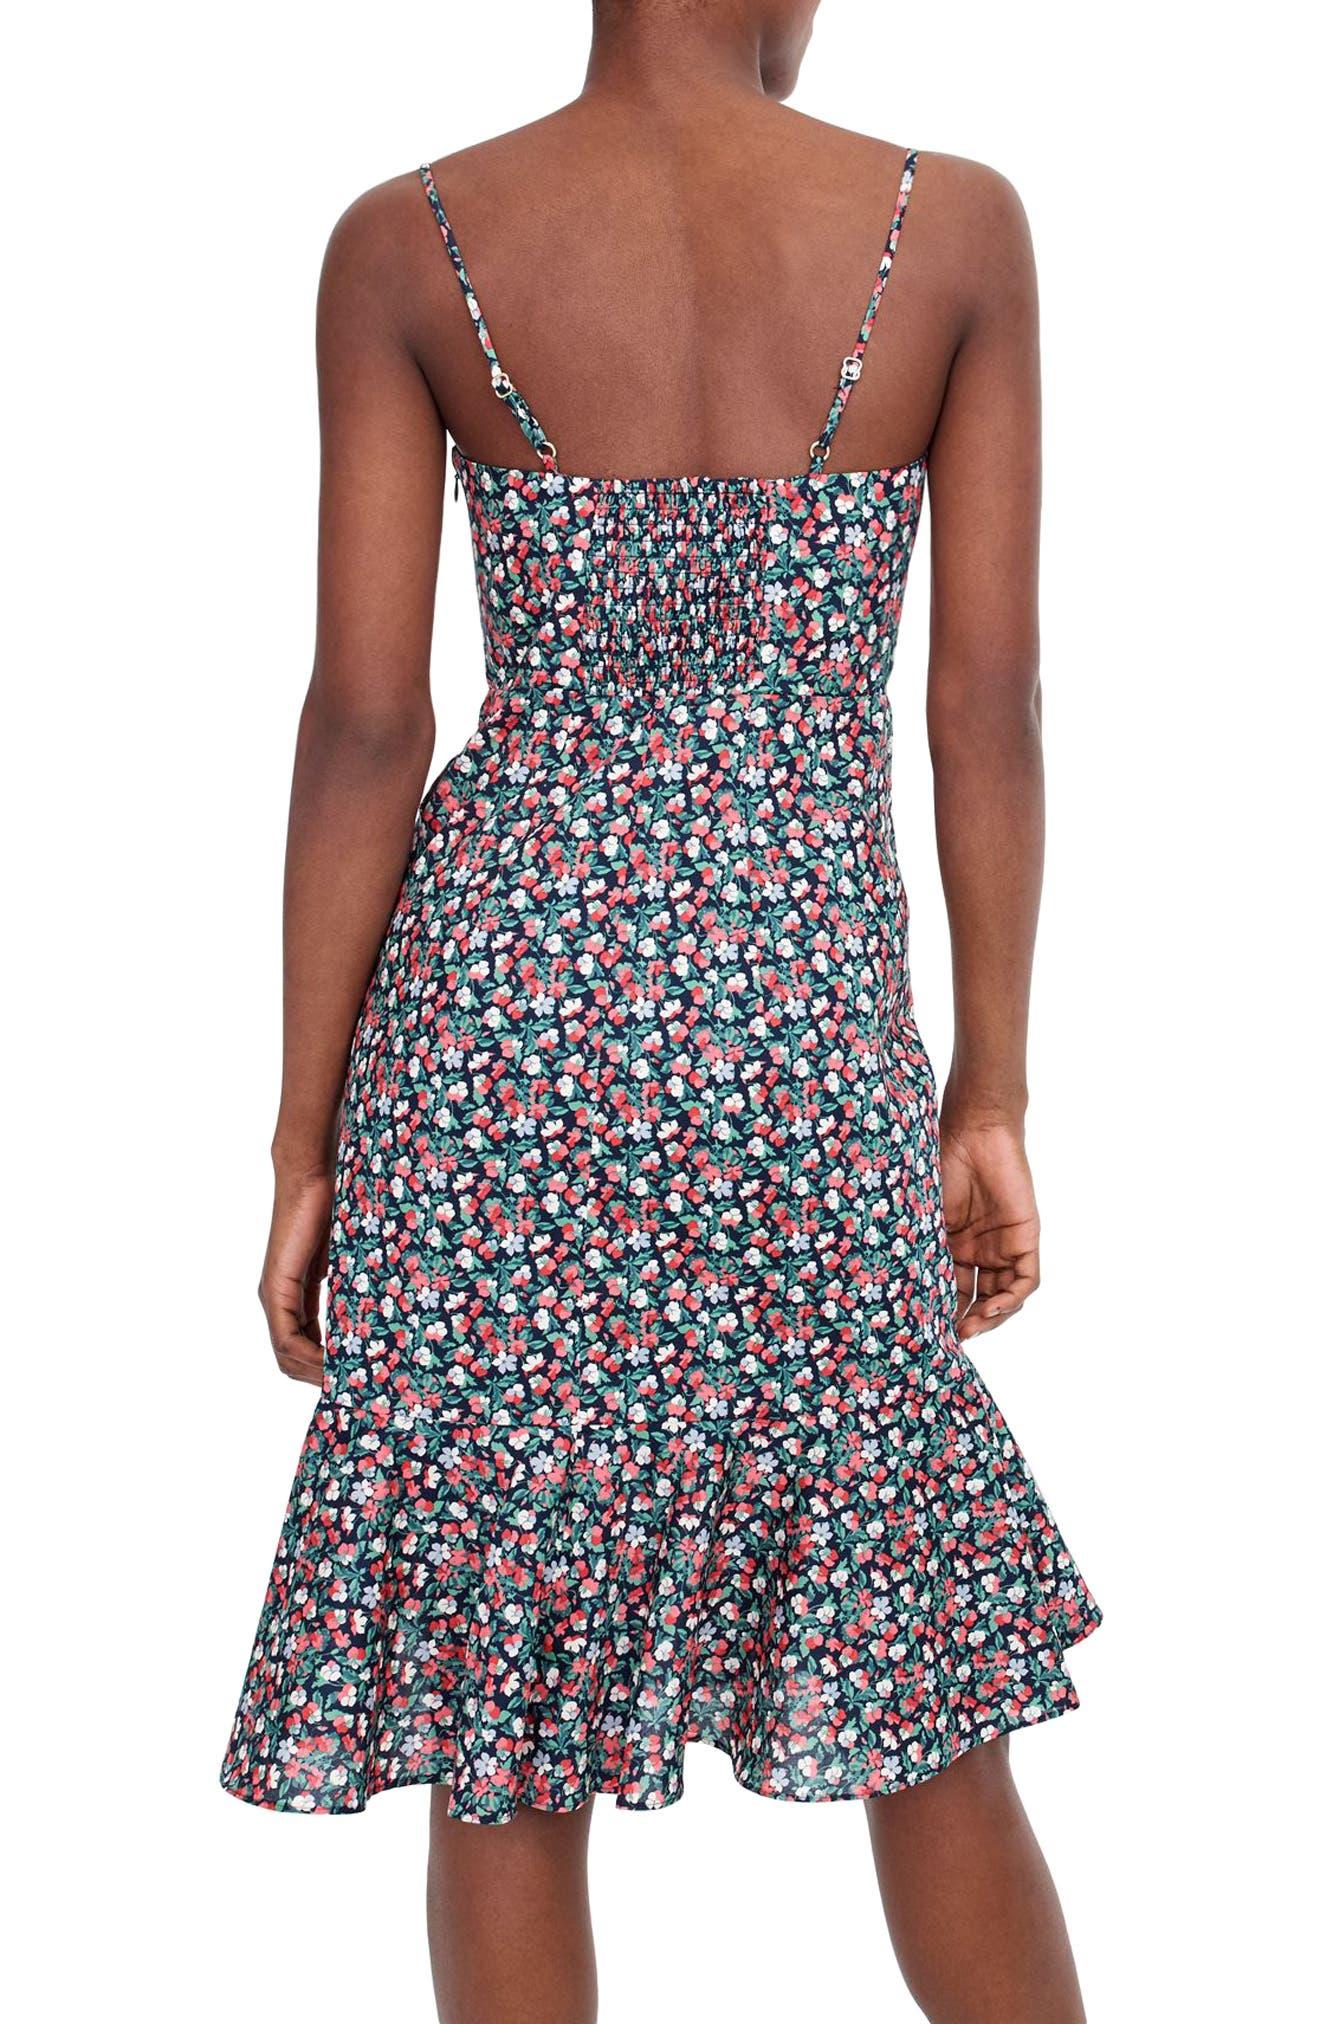 Liberty<sup>®</sup> Sarah Ruffle Dress,                             Alternate thumbnail 2, color,                             400